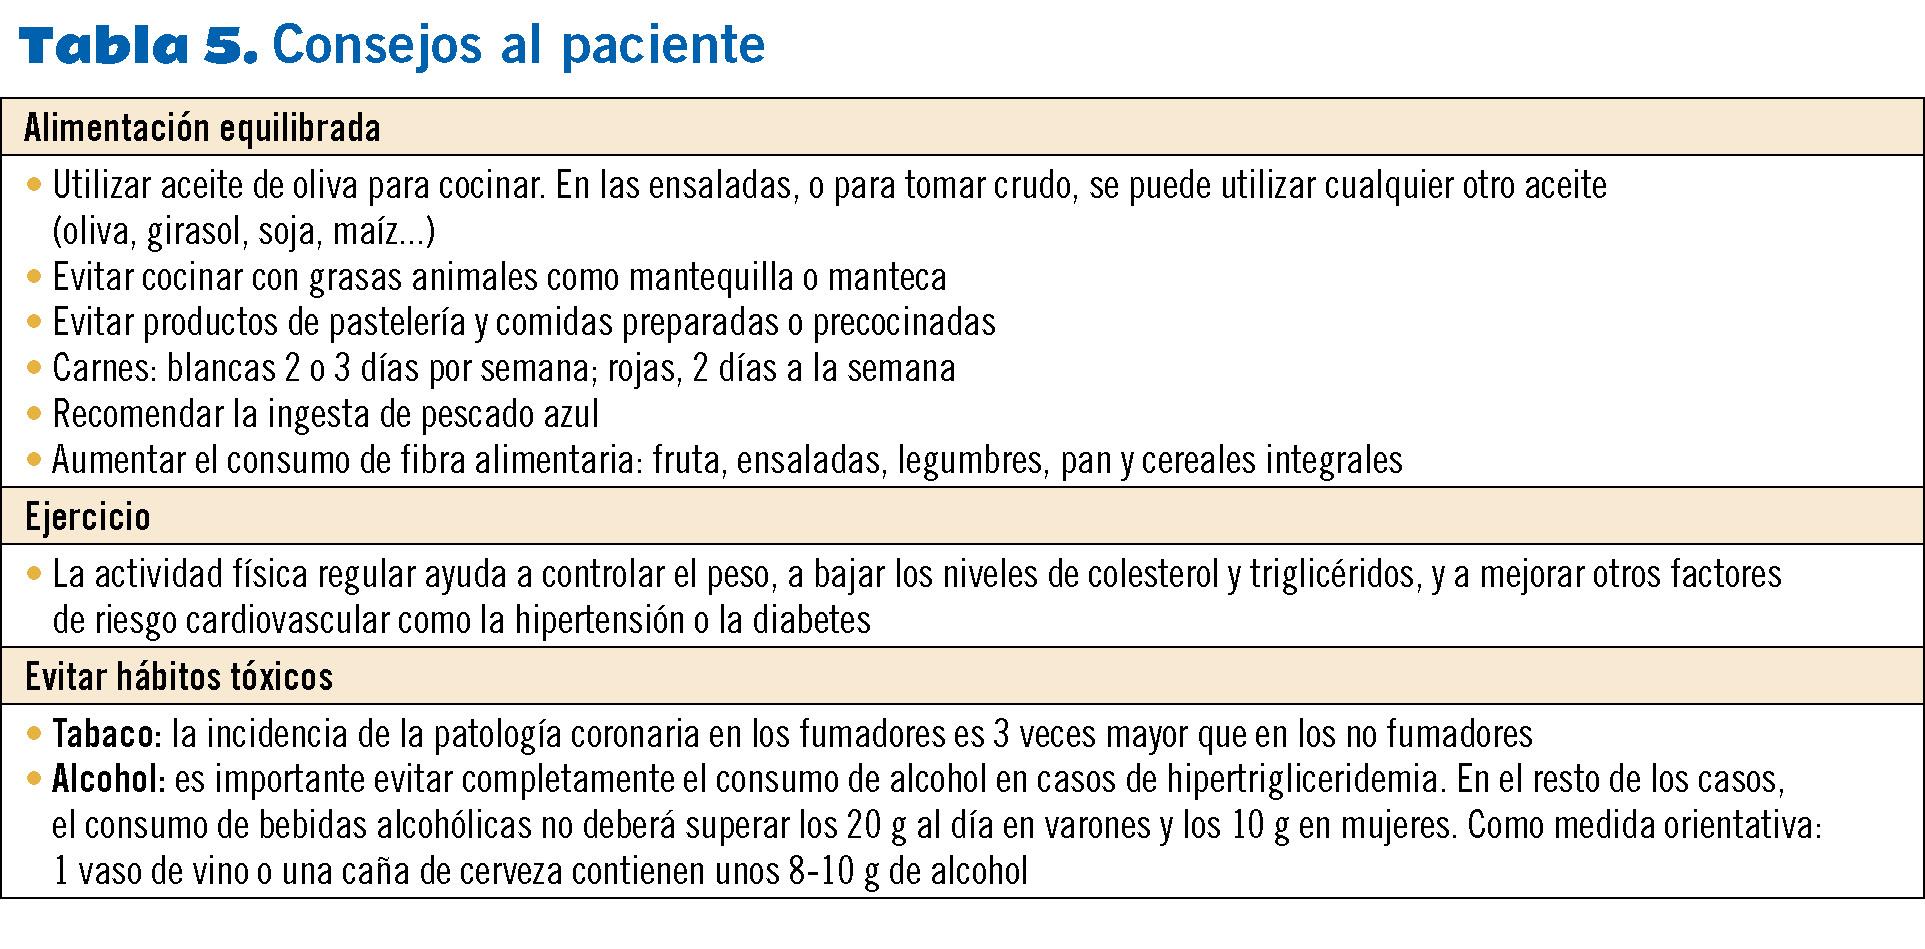 23 EF575 PROTOCOLOS hiperlipidemias tabla 5